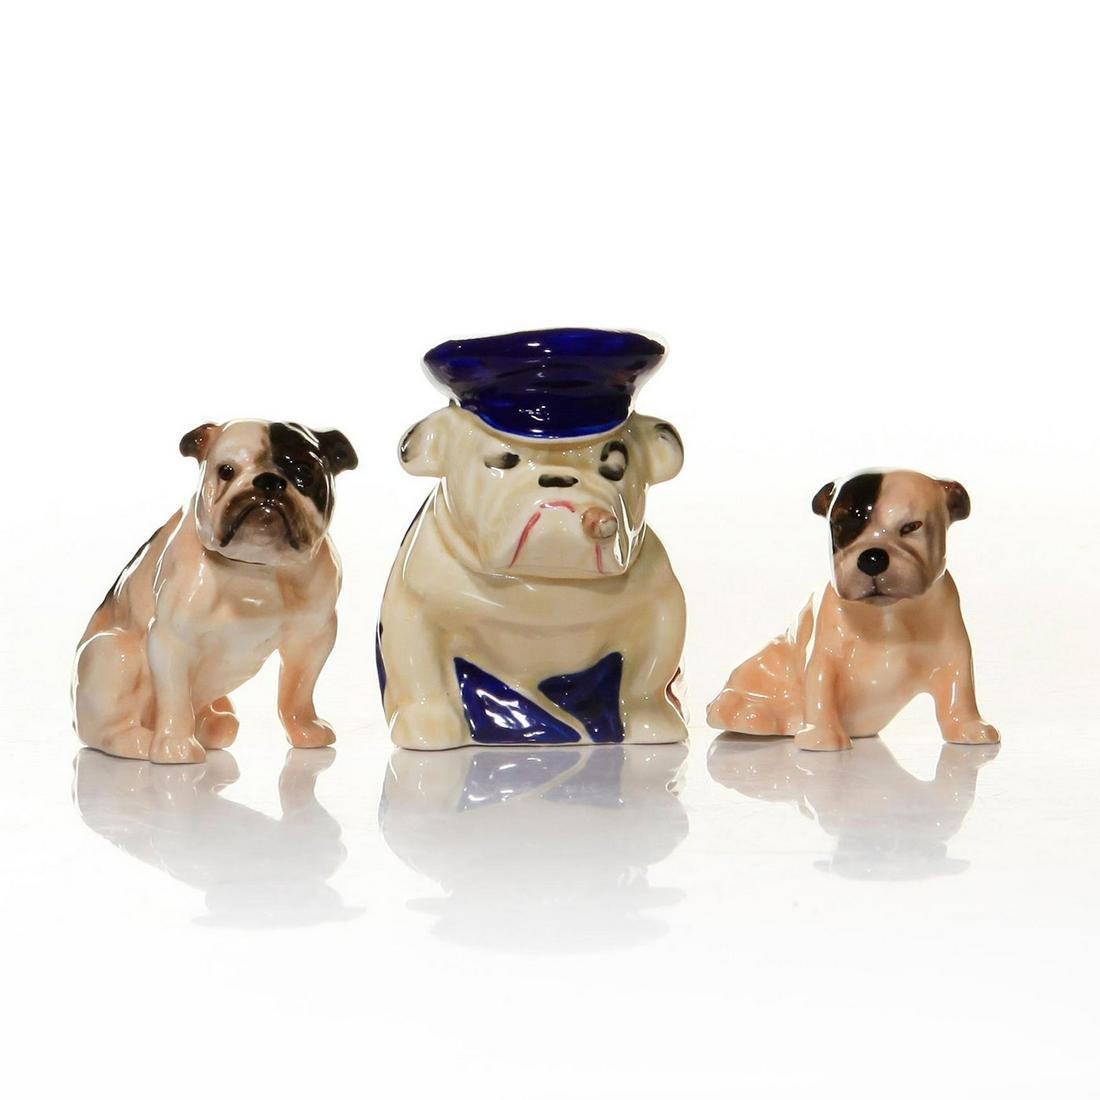 SET OF 3 ROYAL DOULTON DOG FIGURES, SEATED BULLDOGS